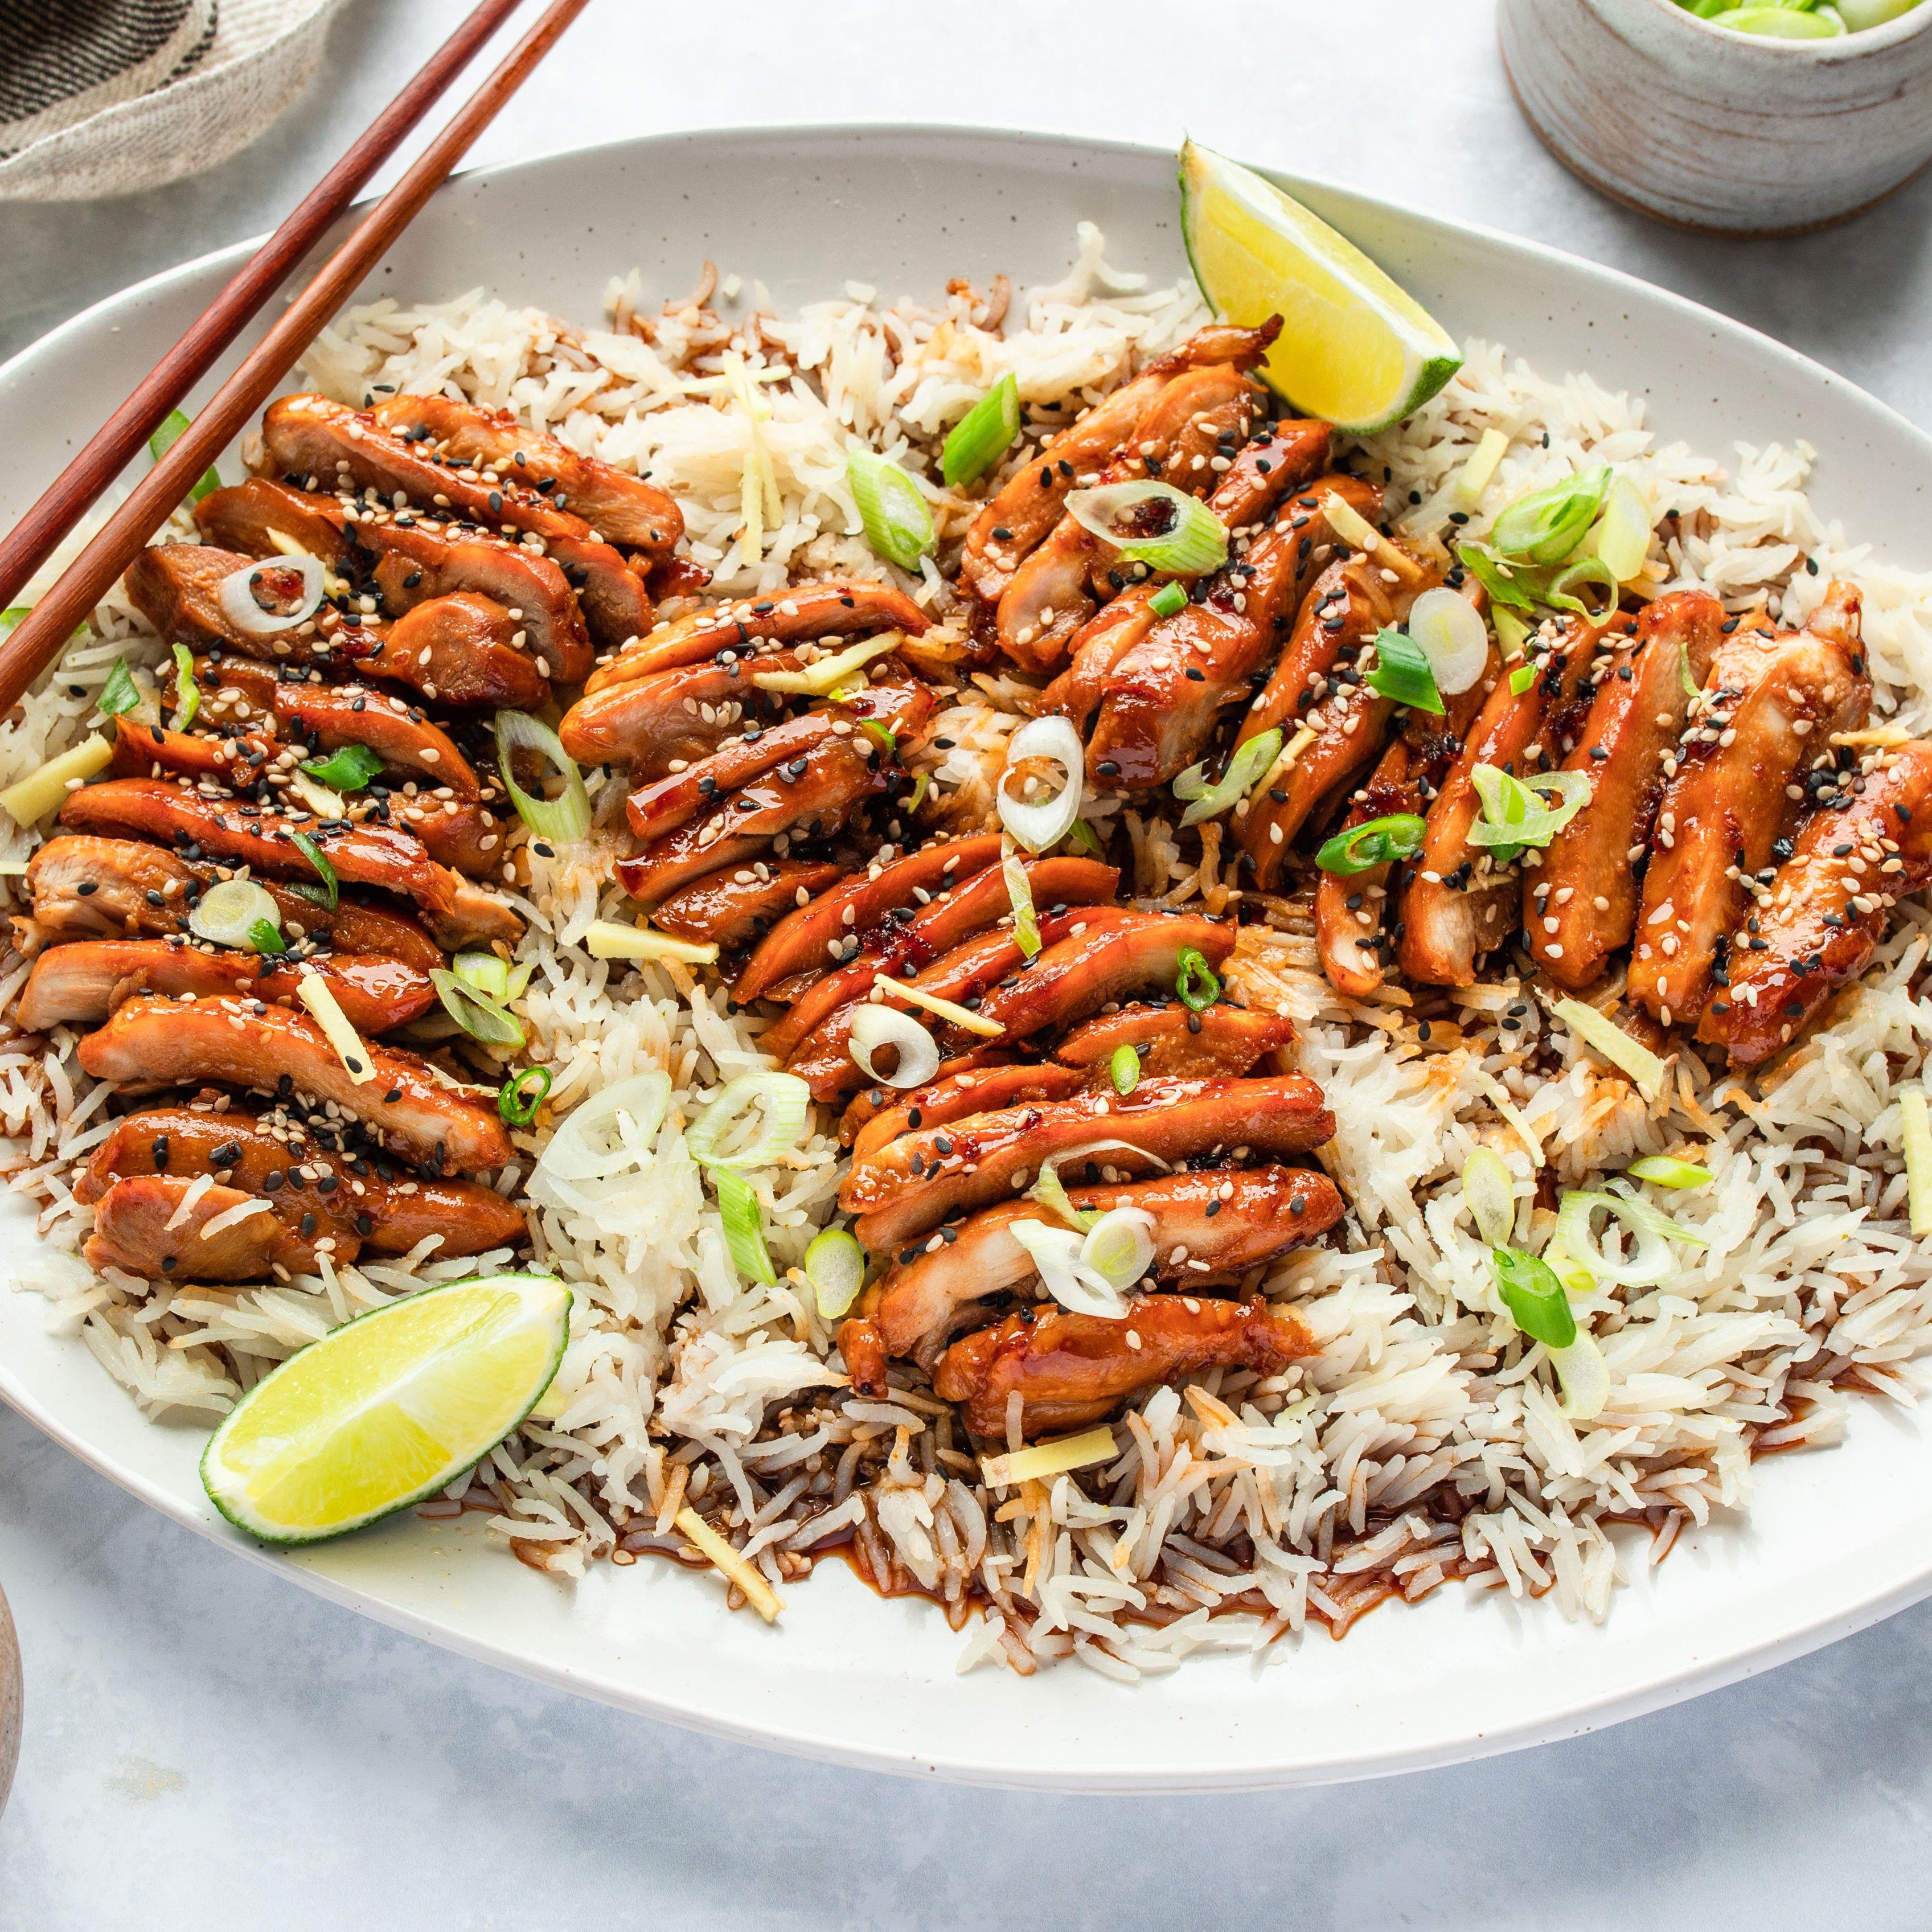 Japanese Restaurant Style Teriyaki Chicken